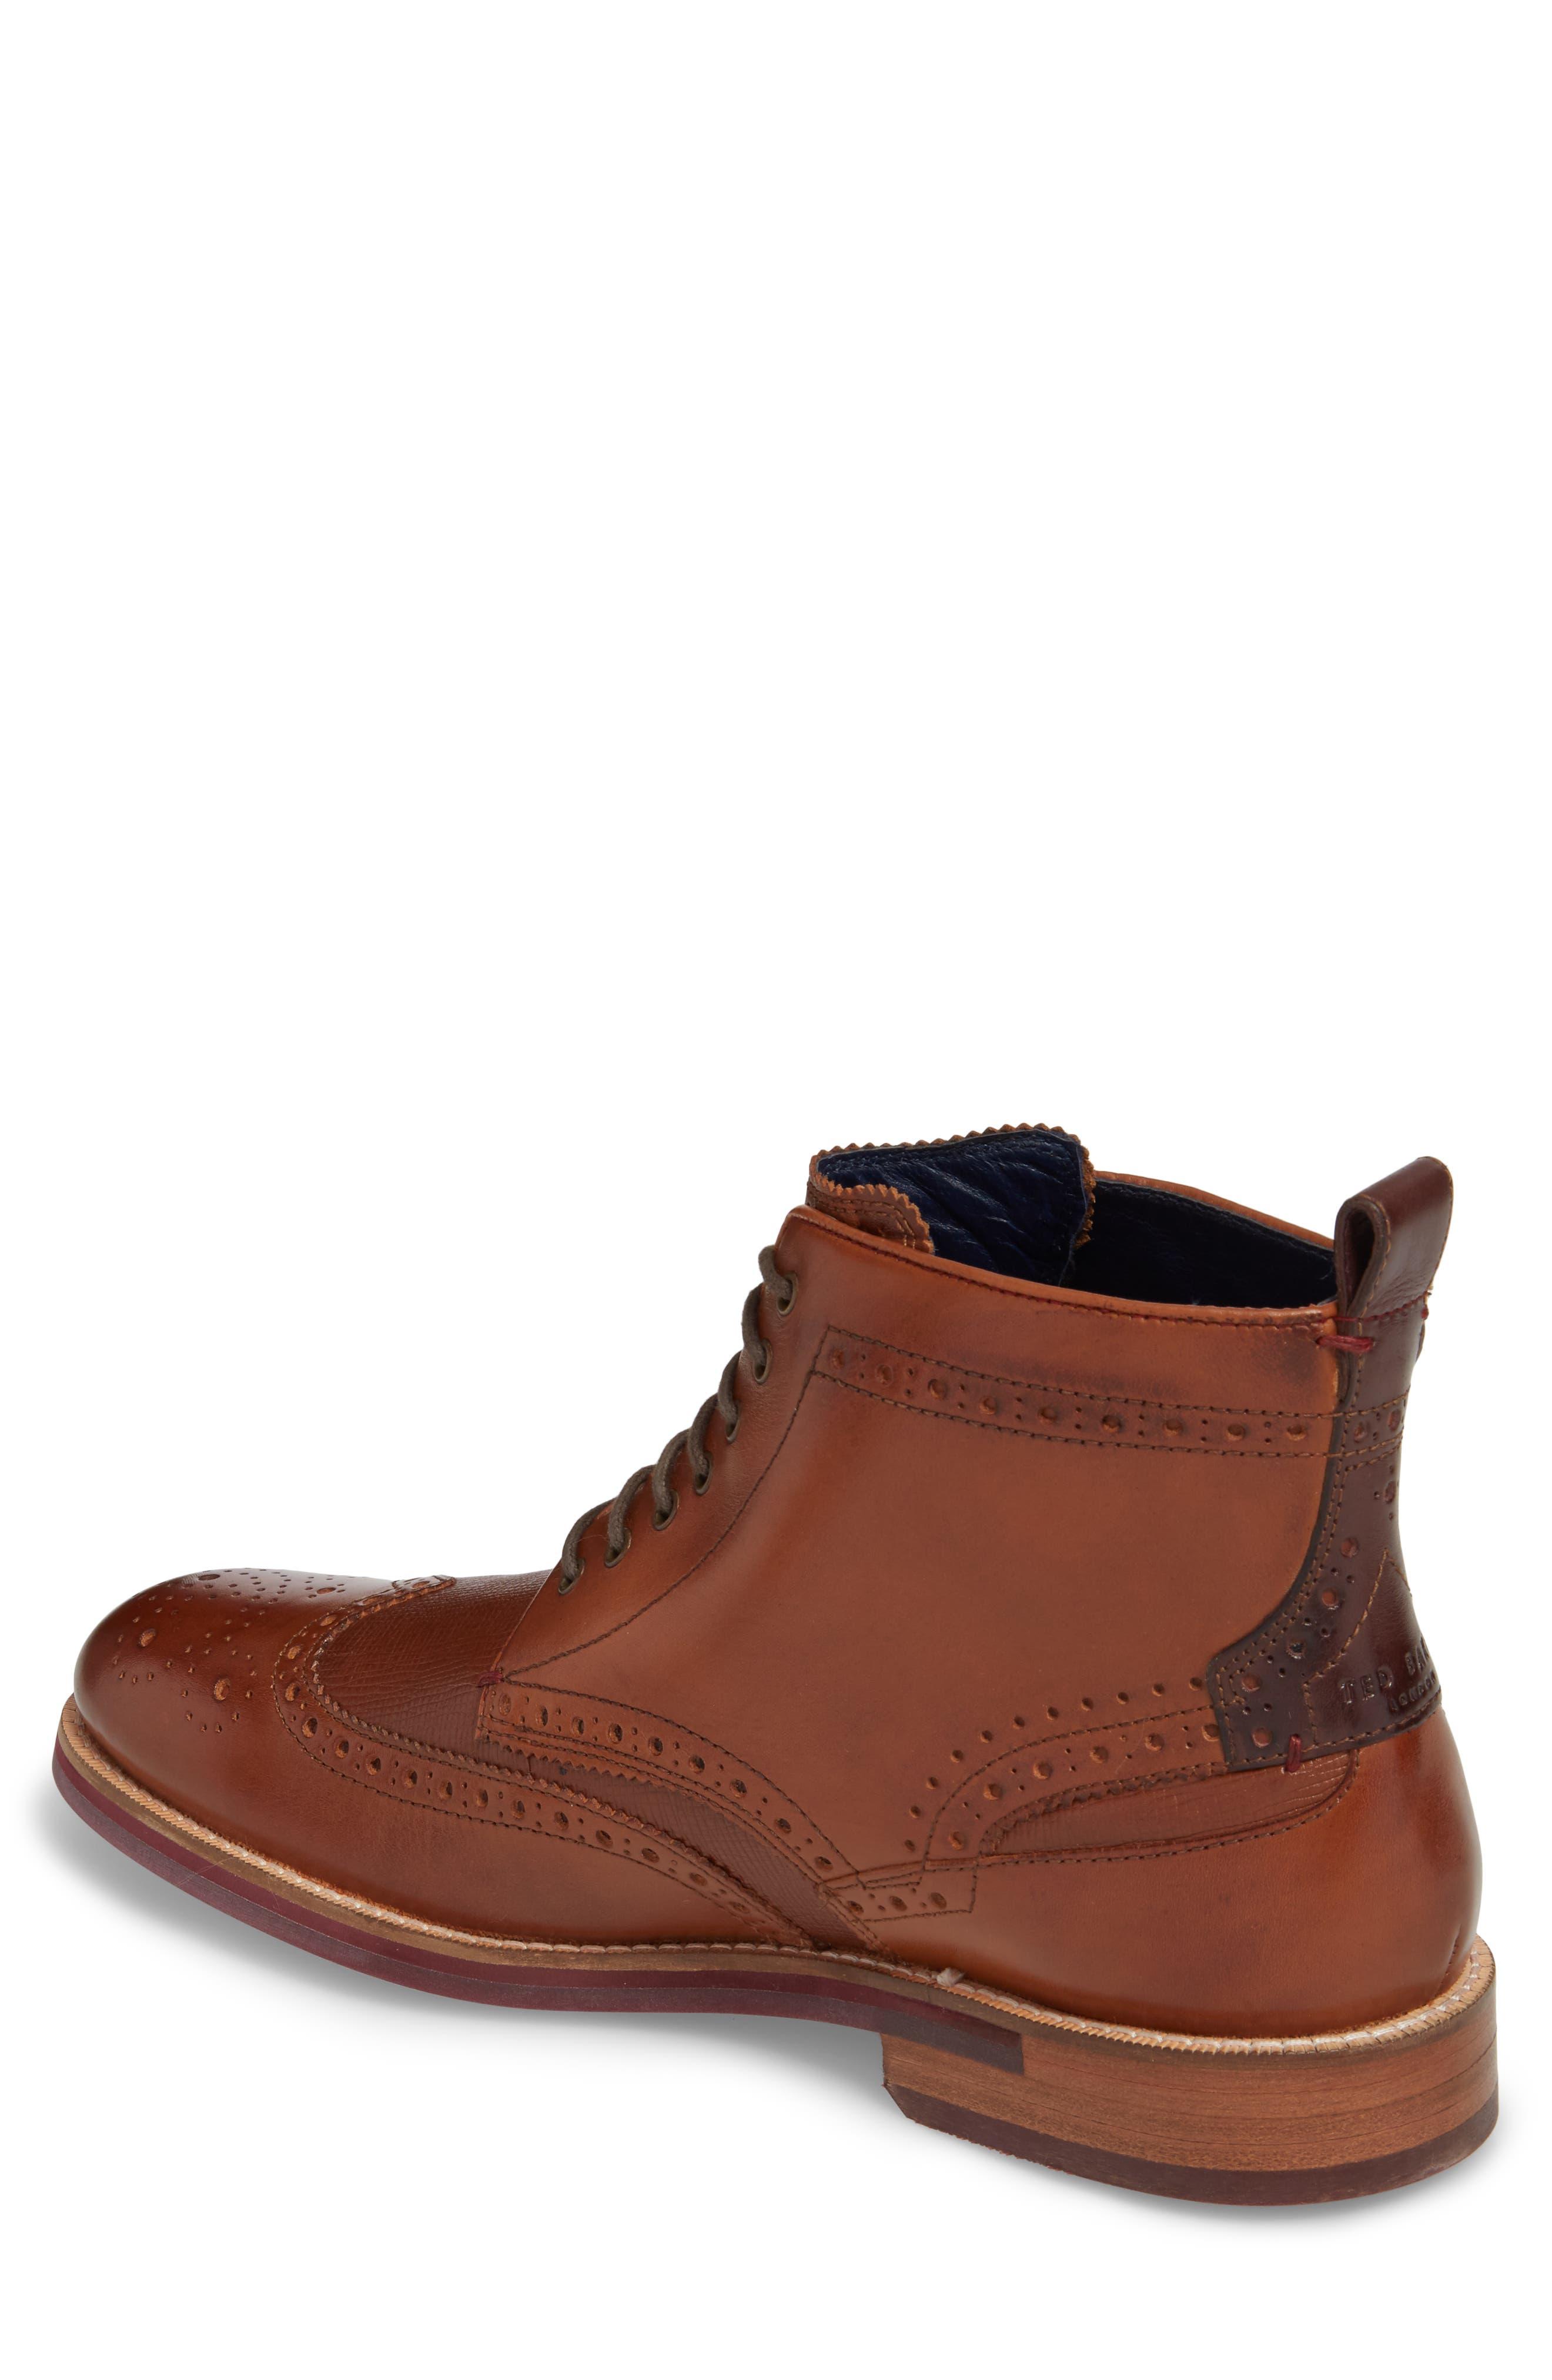 Hjenno Wingtip Boot,                             Alternate thumbnail 2, color,                             Tan Leather